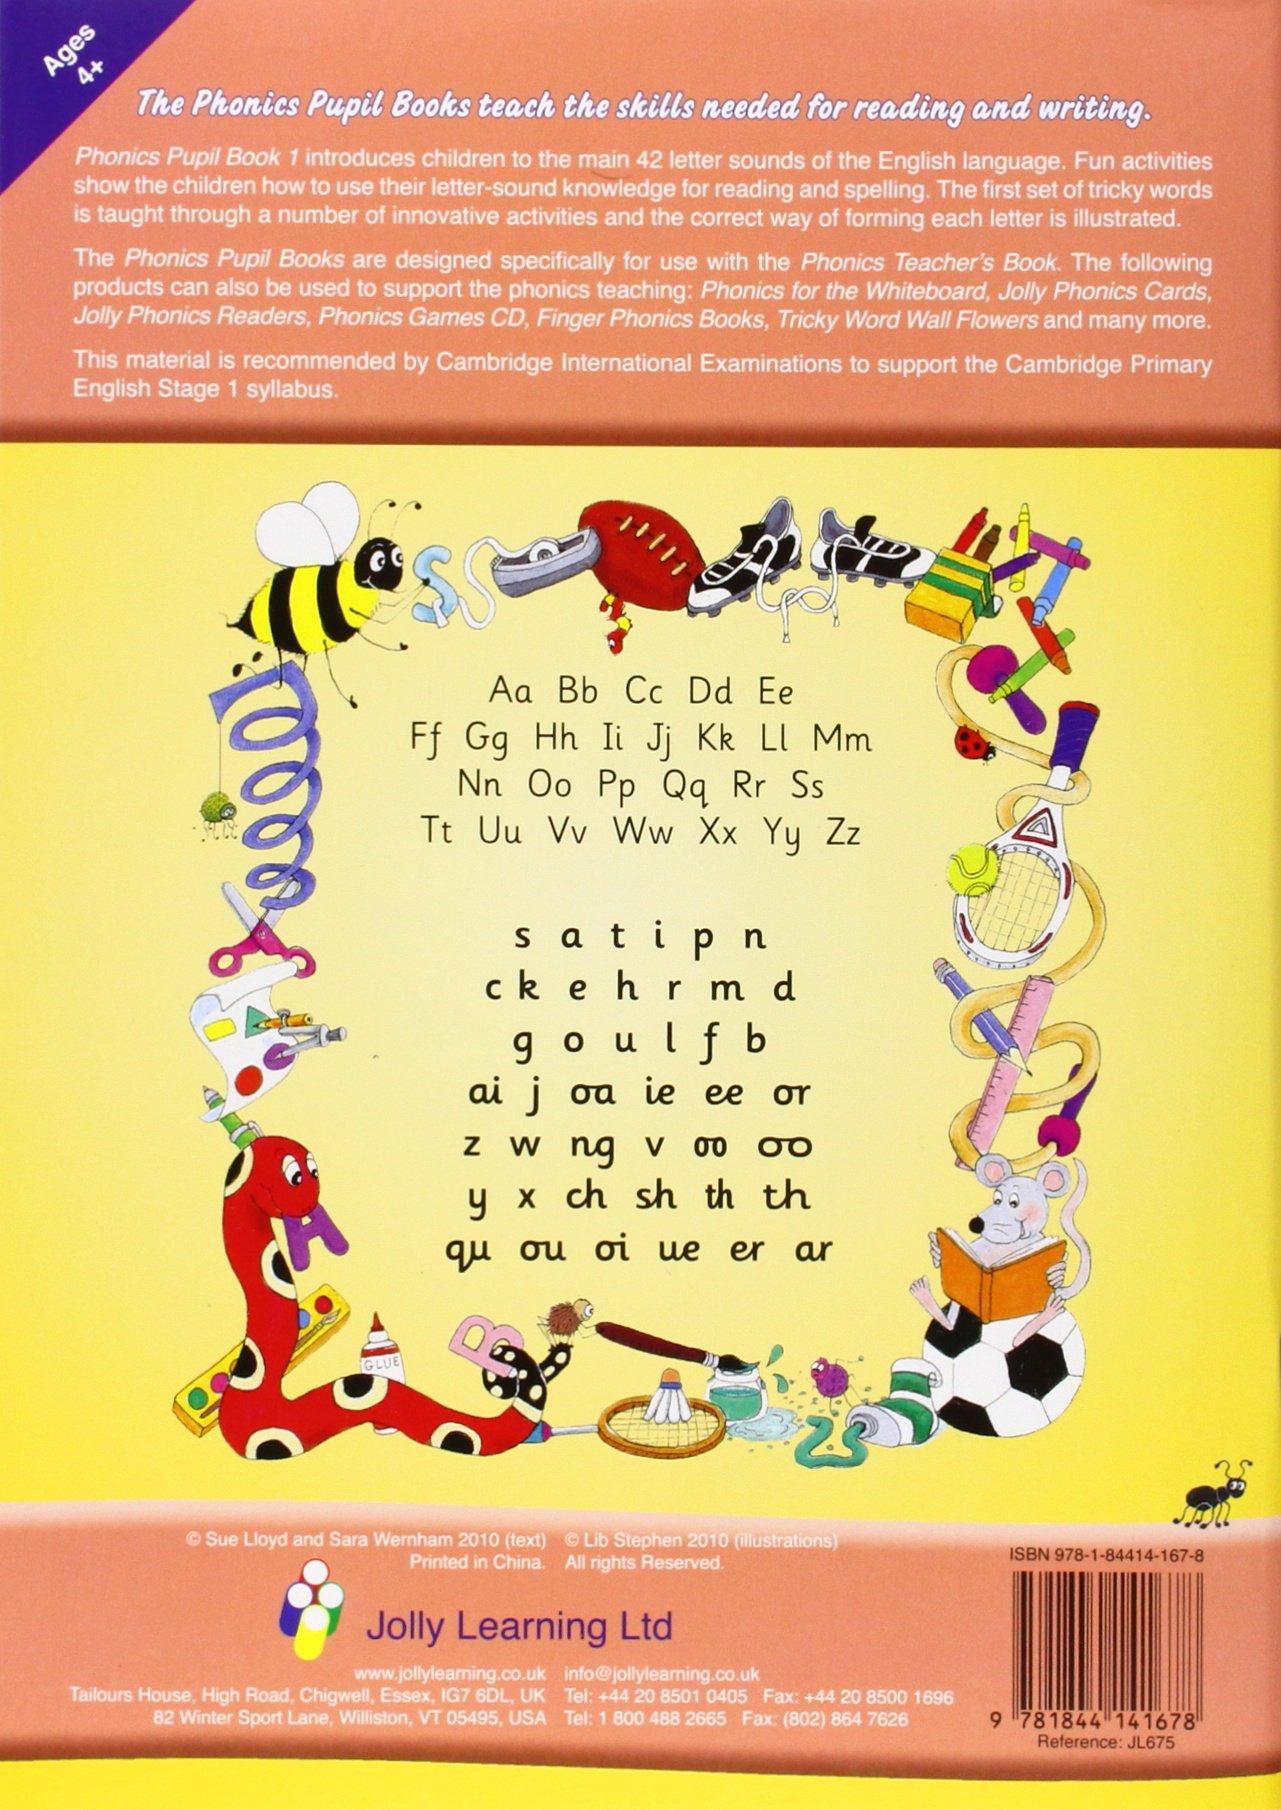 Jolly Phonics Pupil Book 1: in Precursive Letters (British English edition)  (Jolly Learning): Amazon.co.uk: Sara Wernham, Sue Lloyd, Lib Stephen: ...